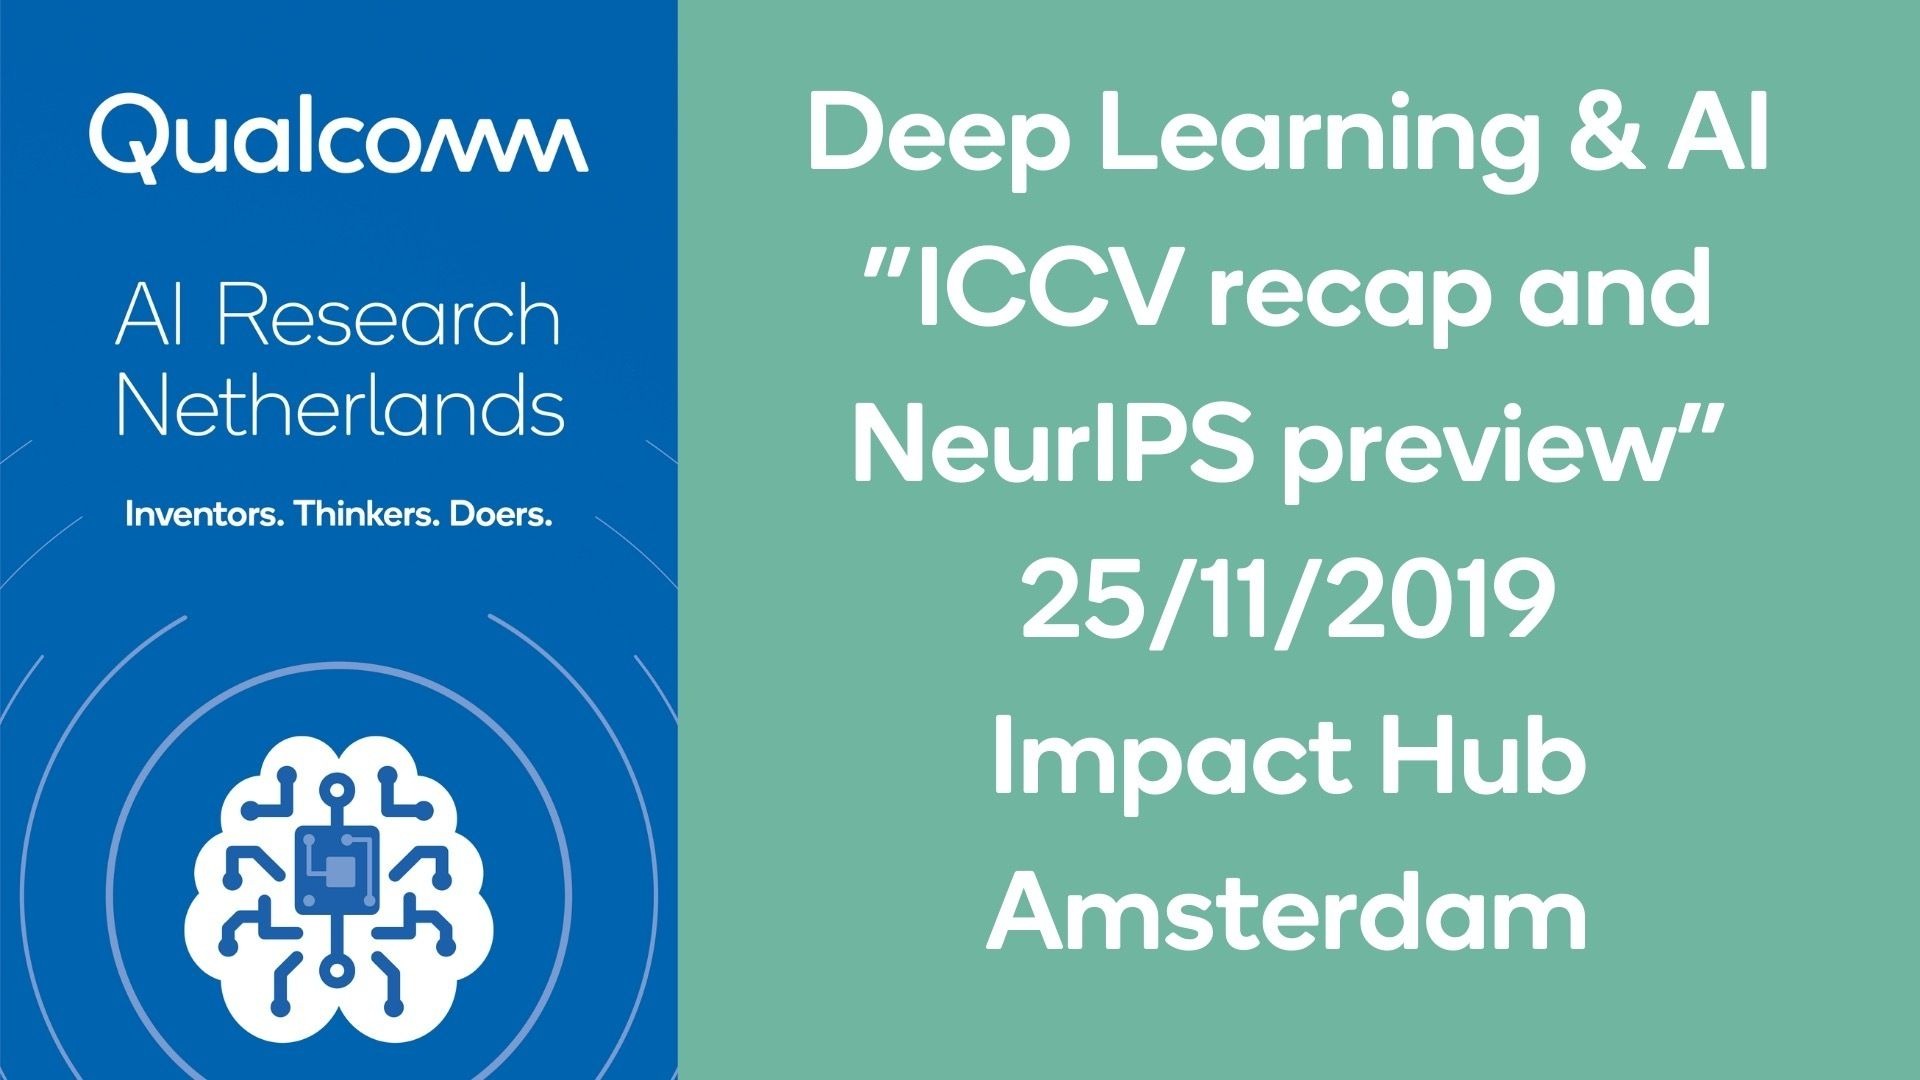 Deep Learning & AI